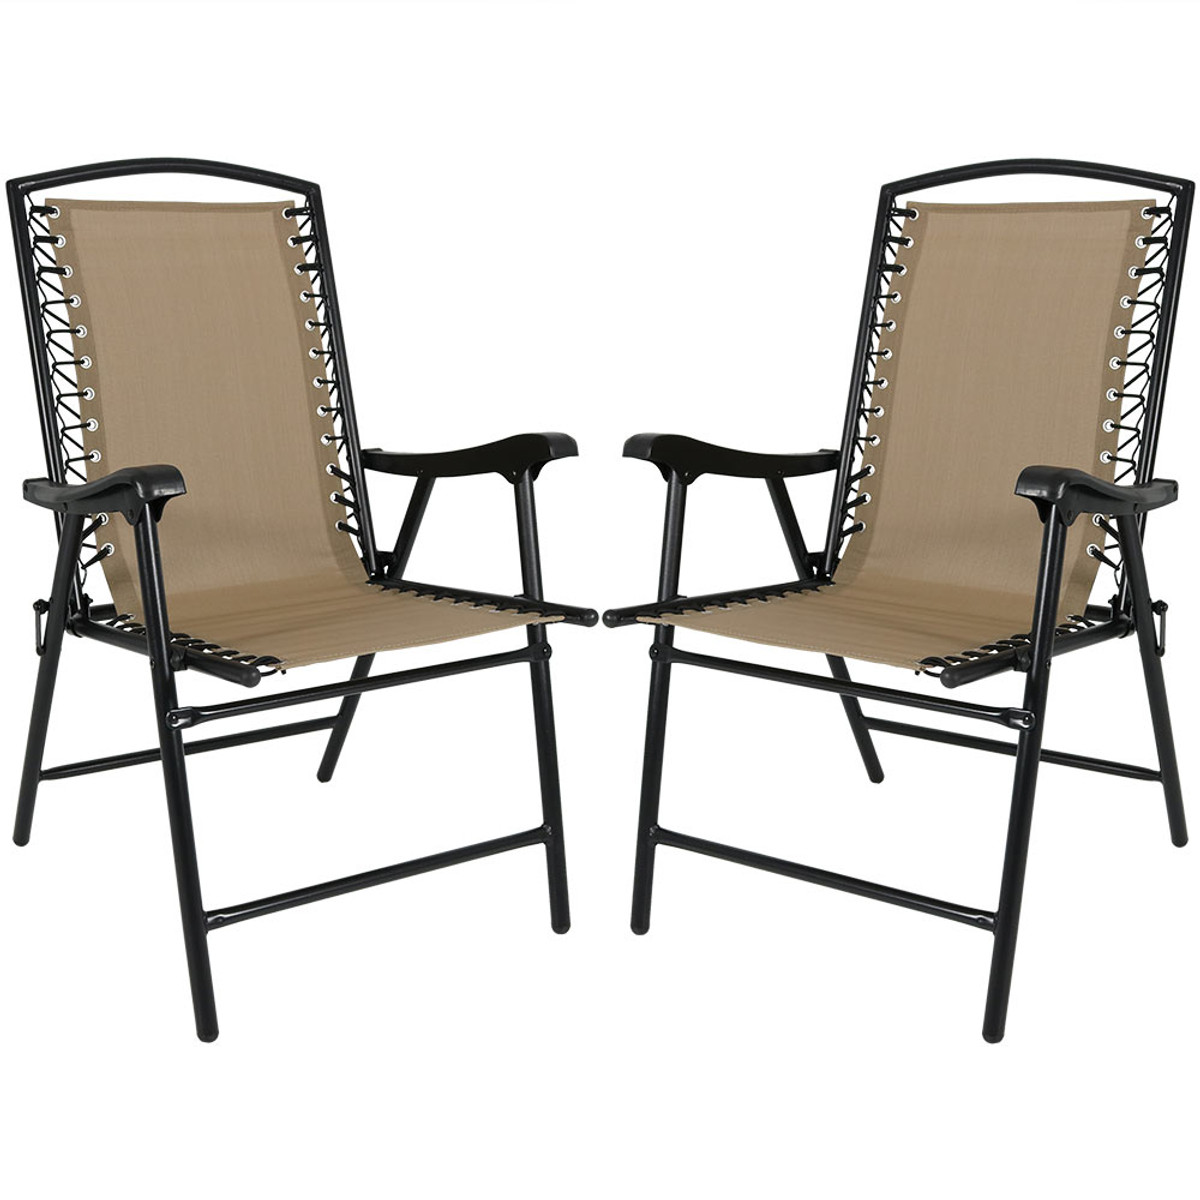 Peachy Sunnydaze Mesh Outdoor Suspension Folding Patio Lounge Chair Pabps2019 Chair Design Images Pabps2019Com